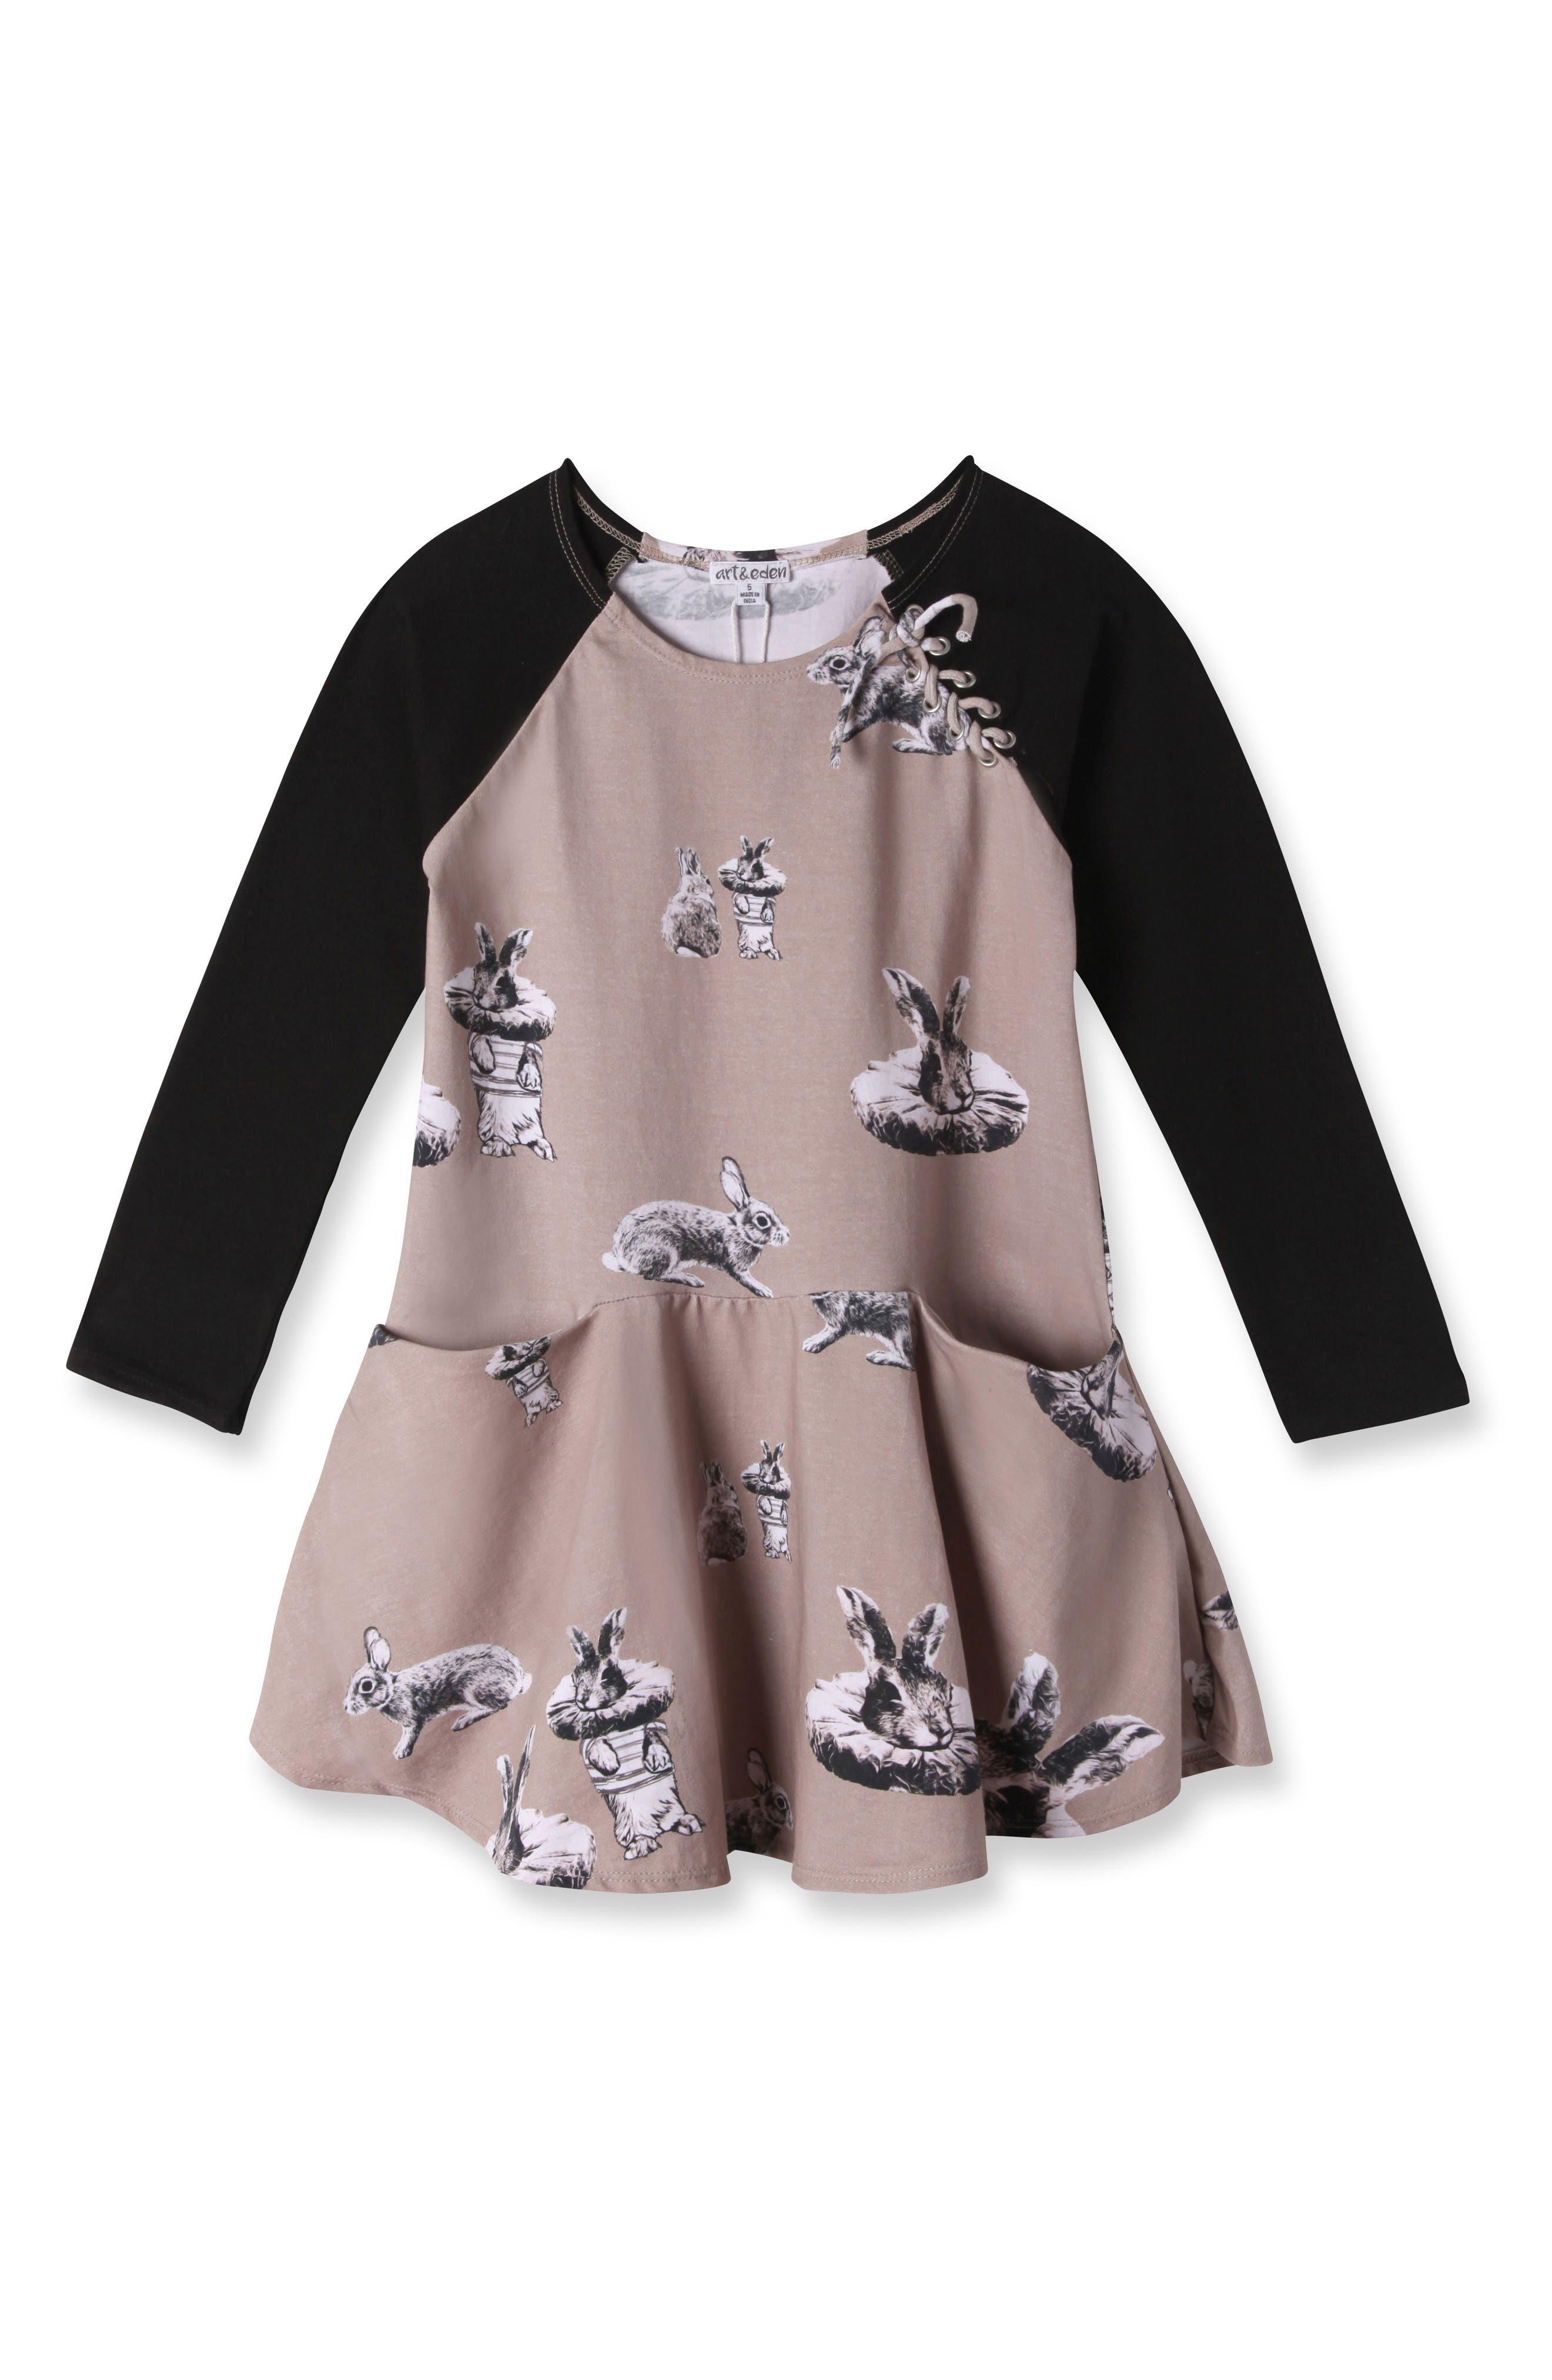 Main Image - Art & Eden Isabella Dress (Toddler Girls & Little Girls)